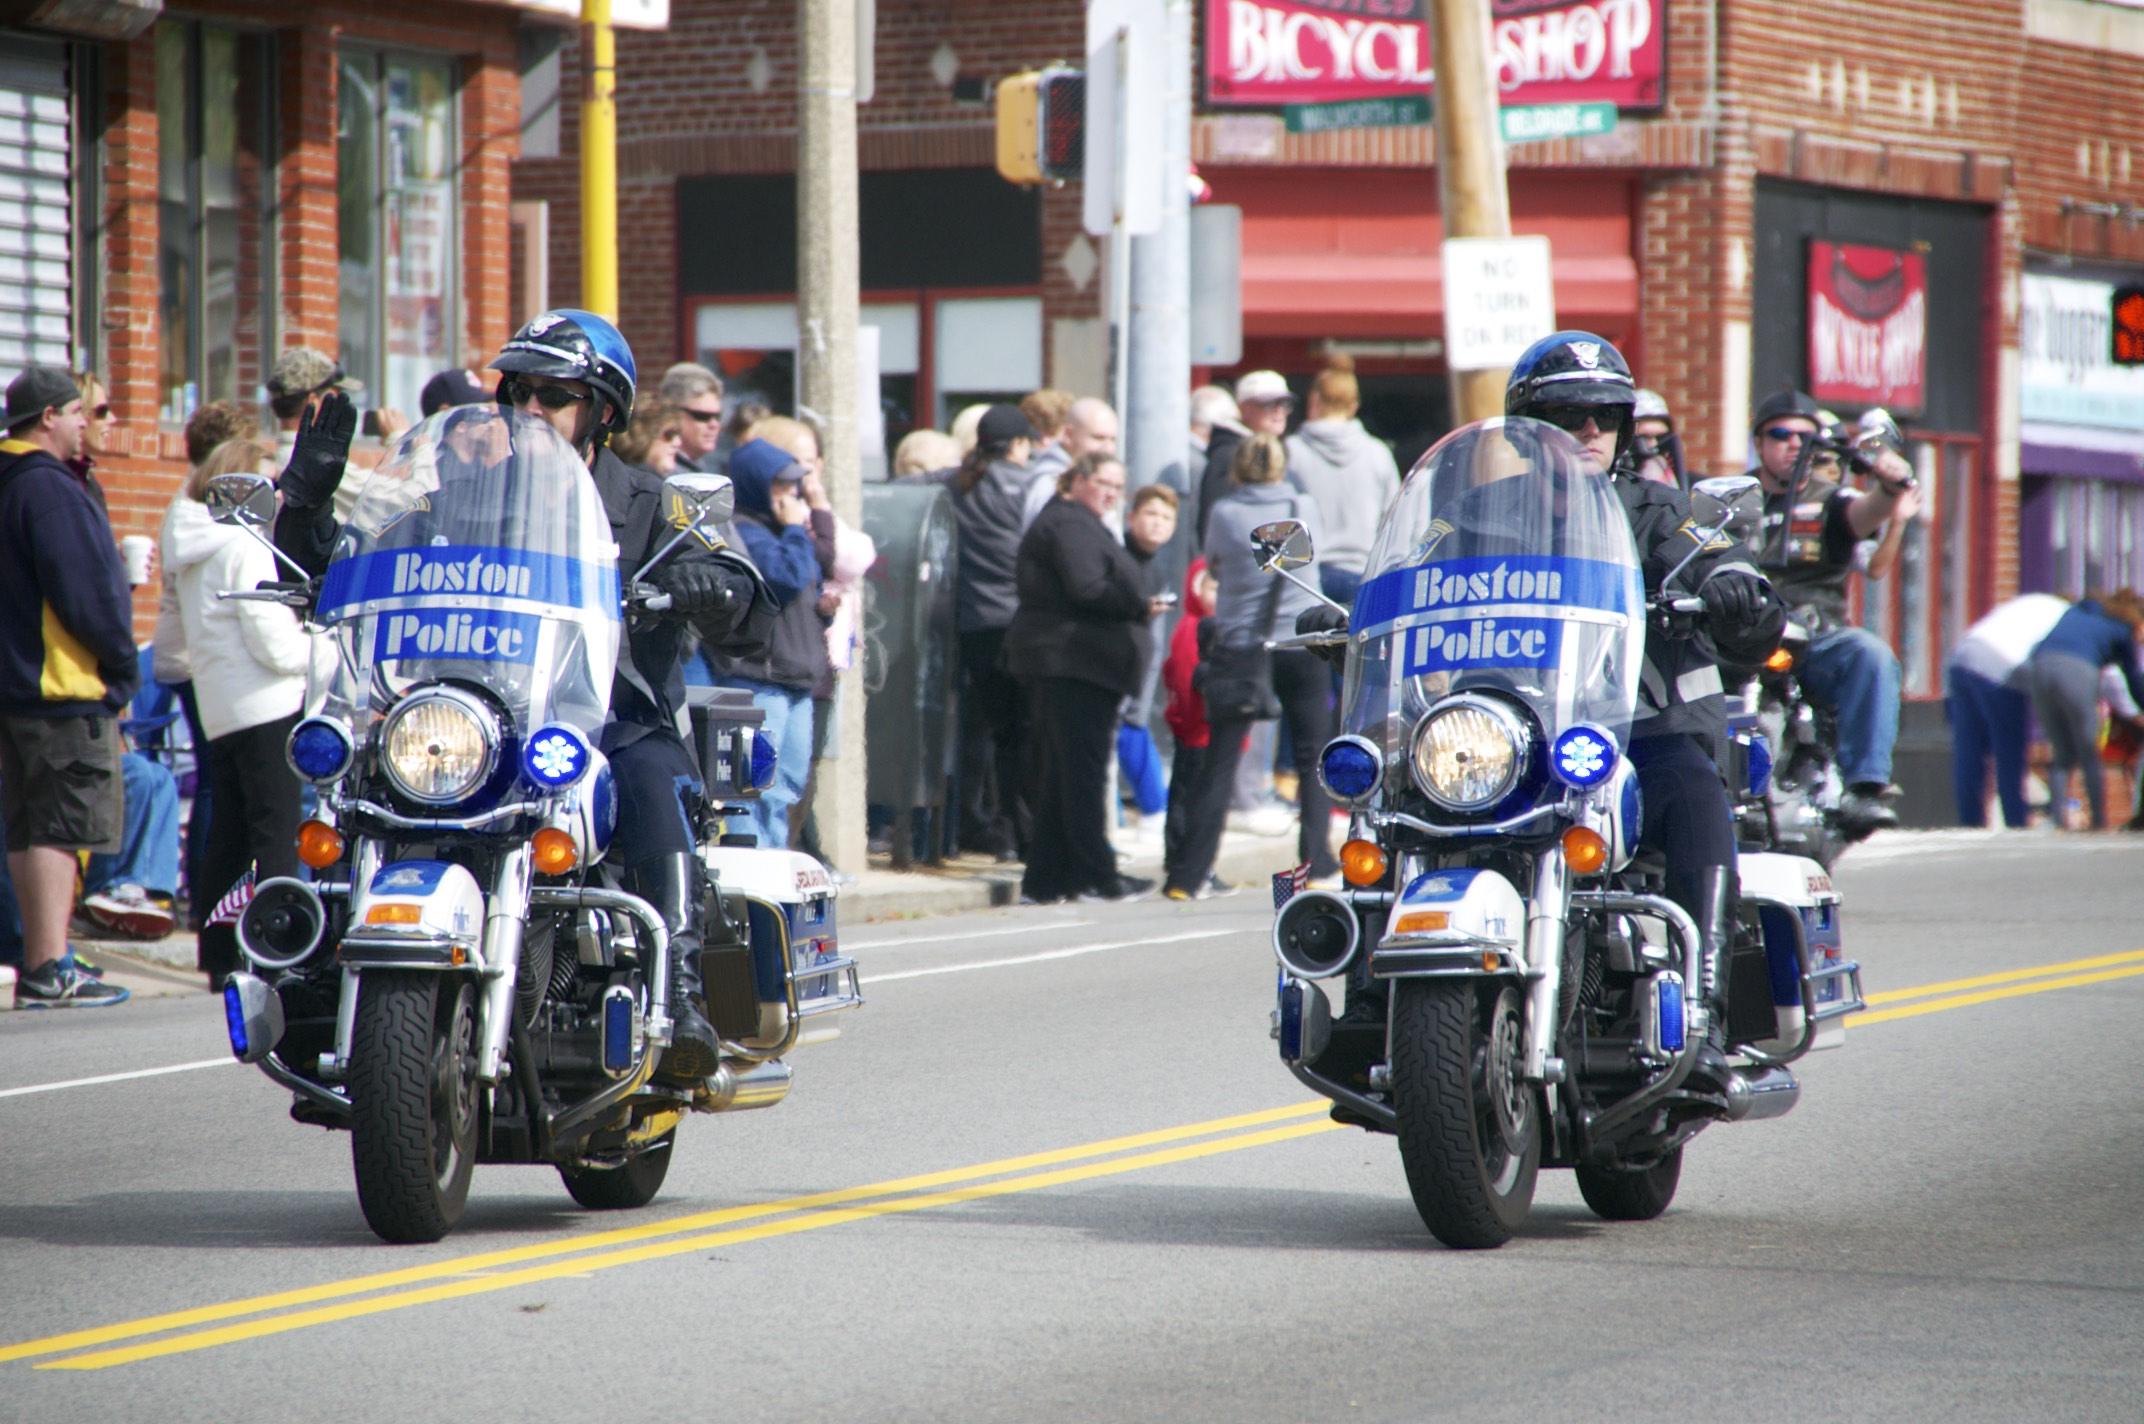 Roslindale_Day_Parade_2015_9.jpg